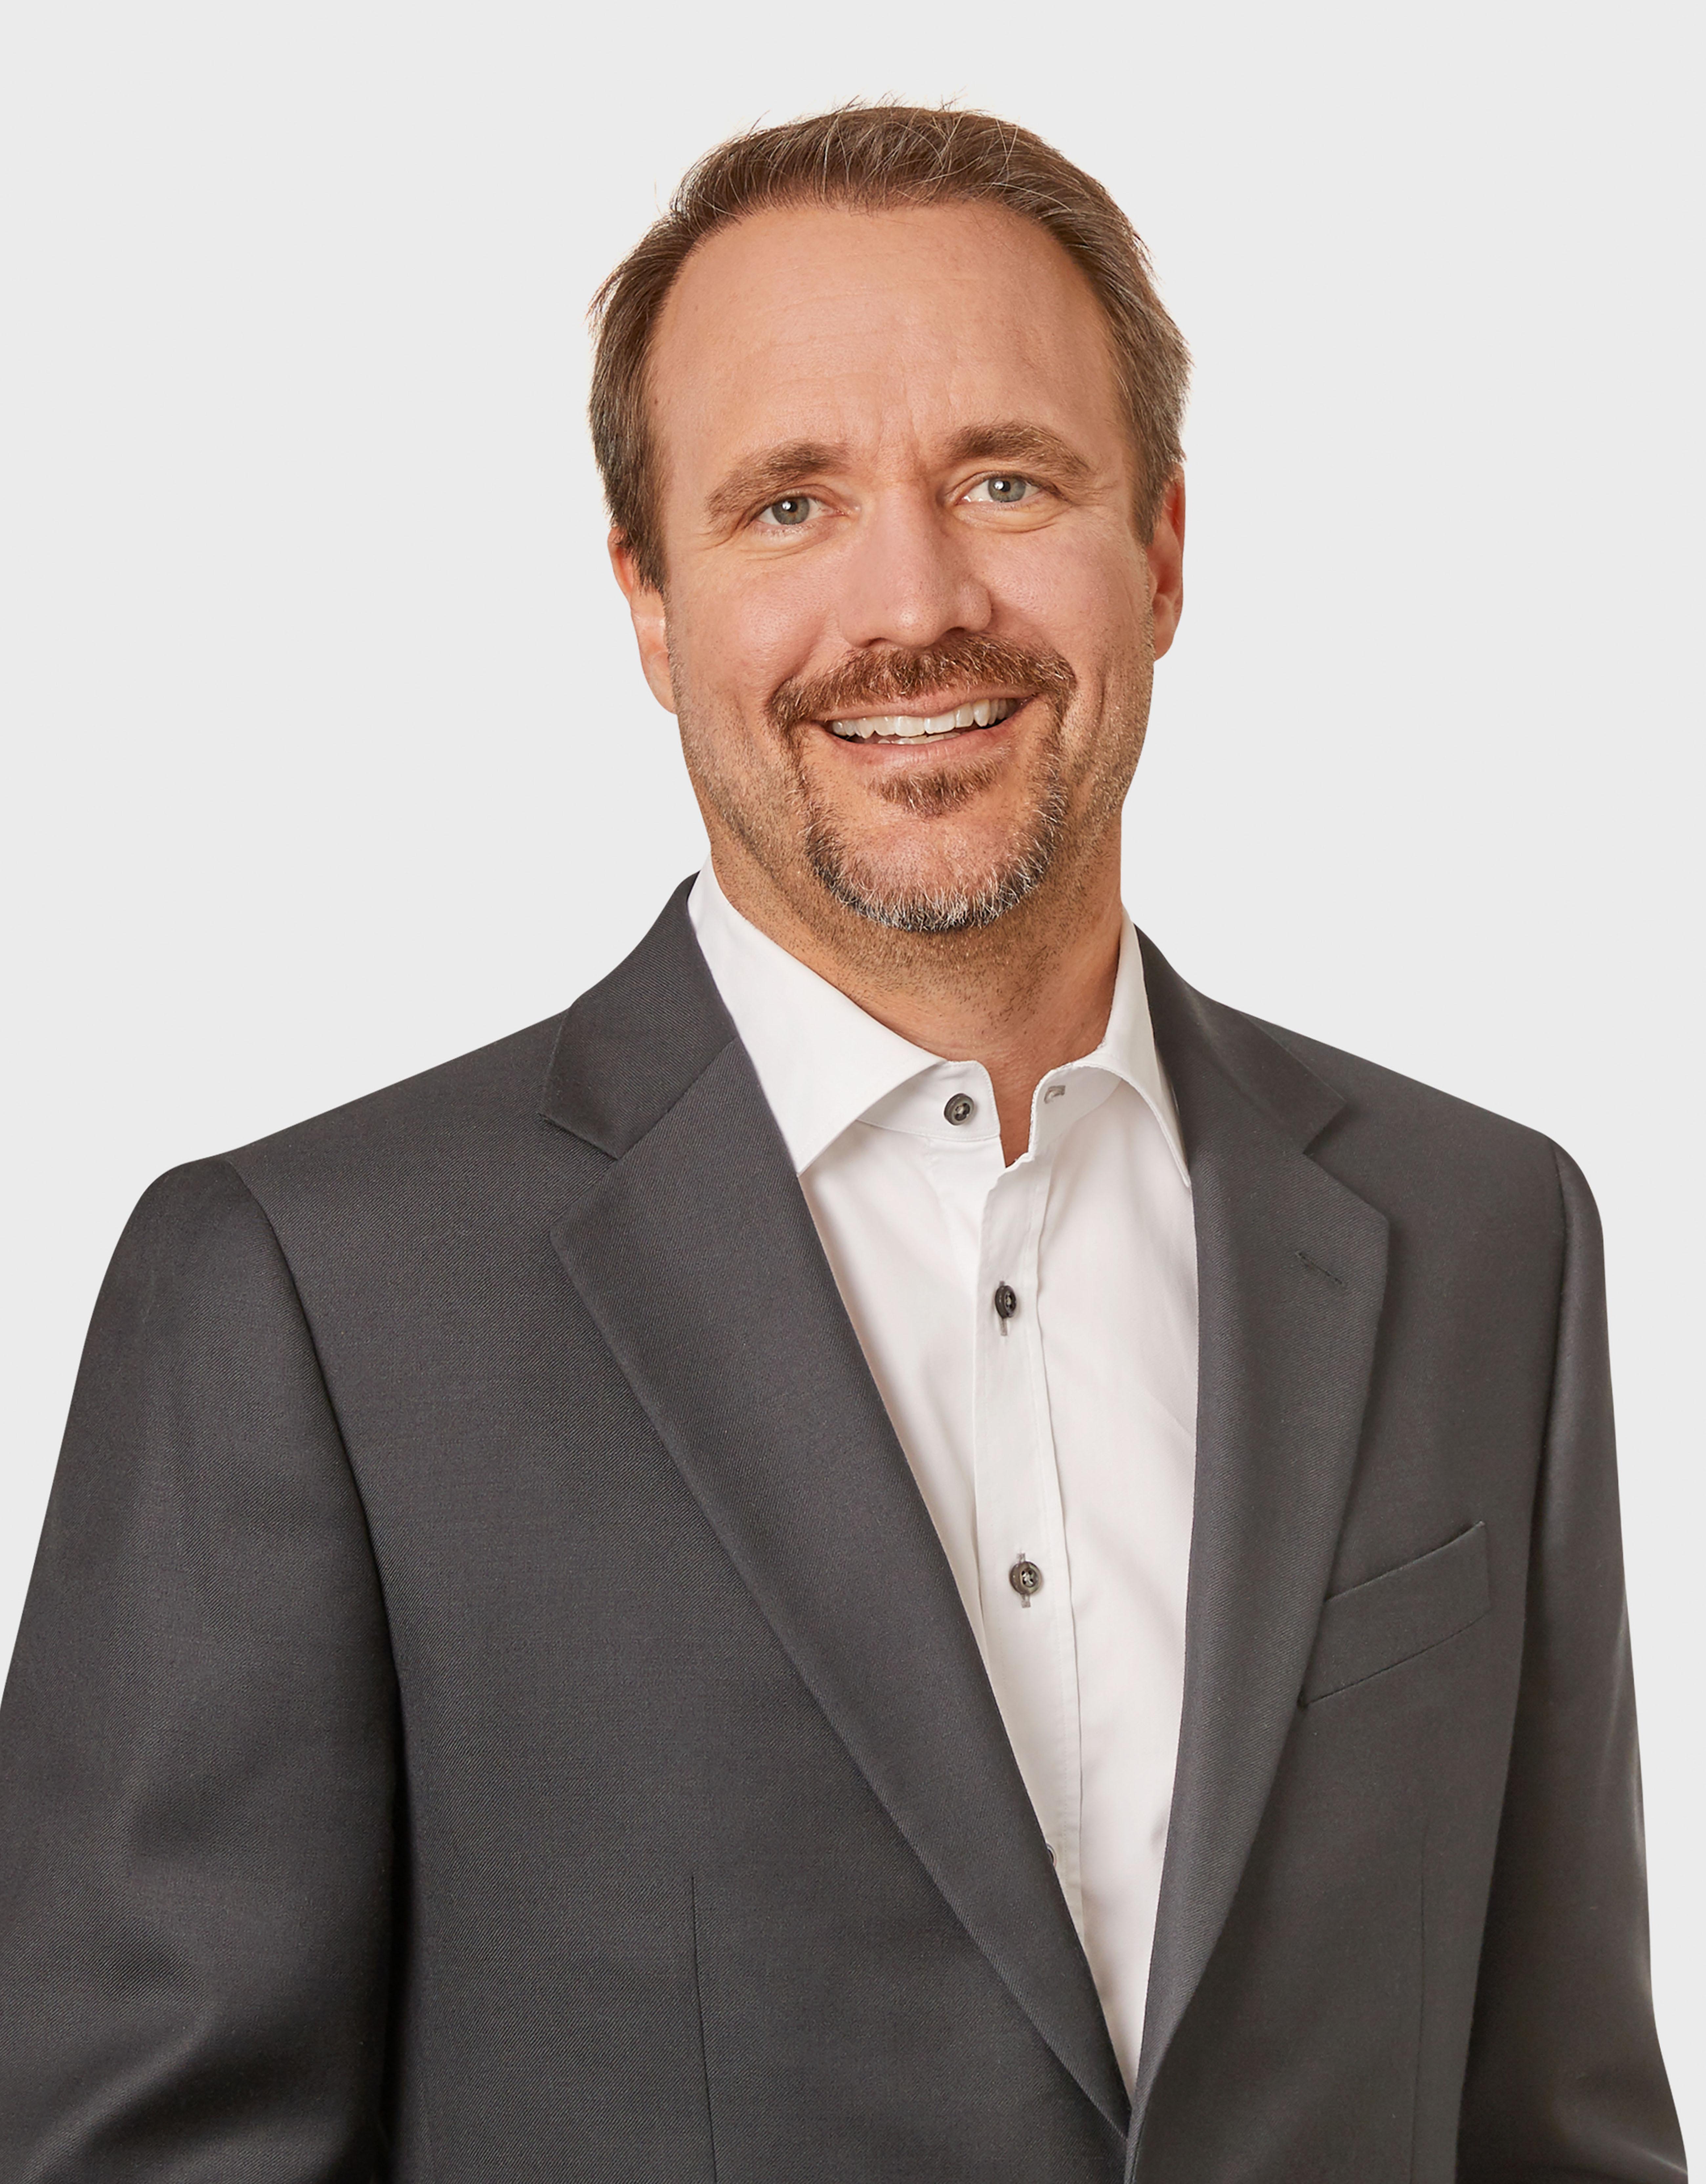 Daniel Riß